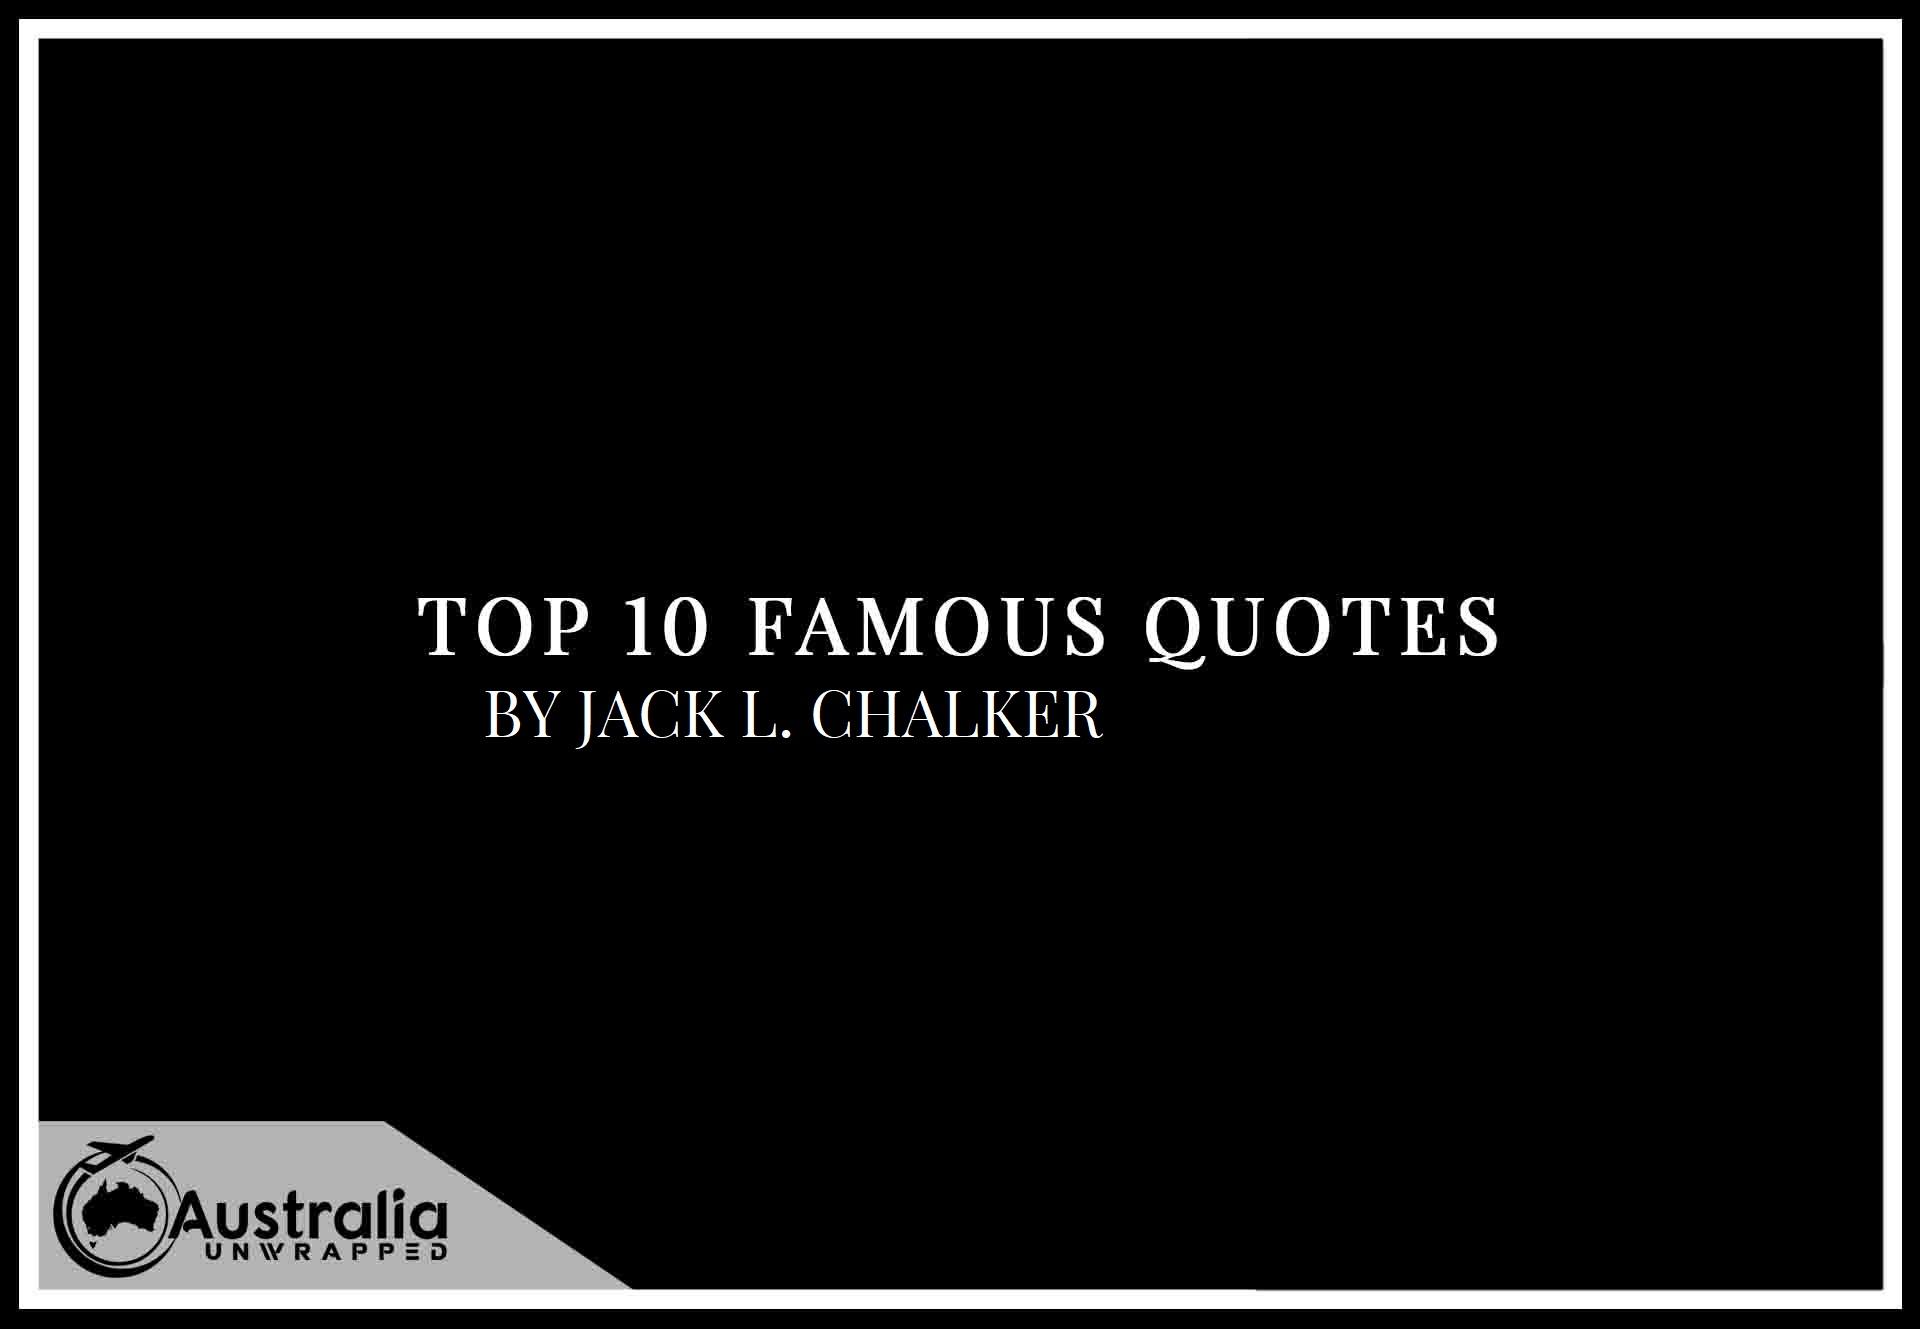 Top 10 Famous Quotes by Author Jack L. Chalker